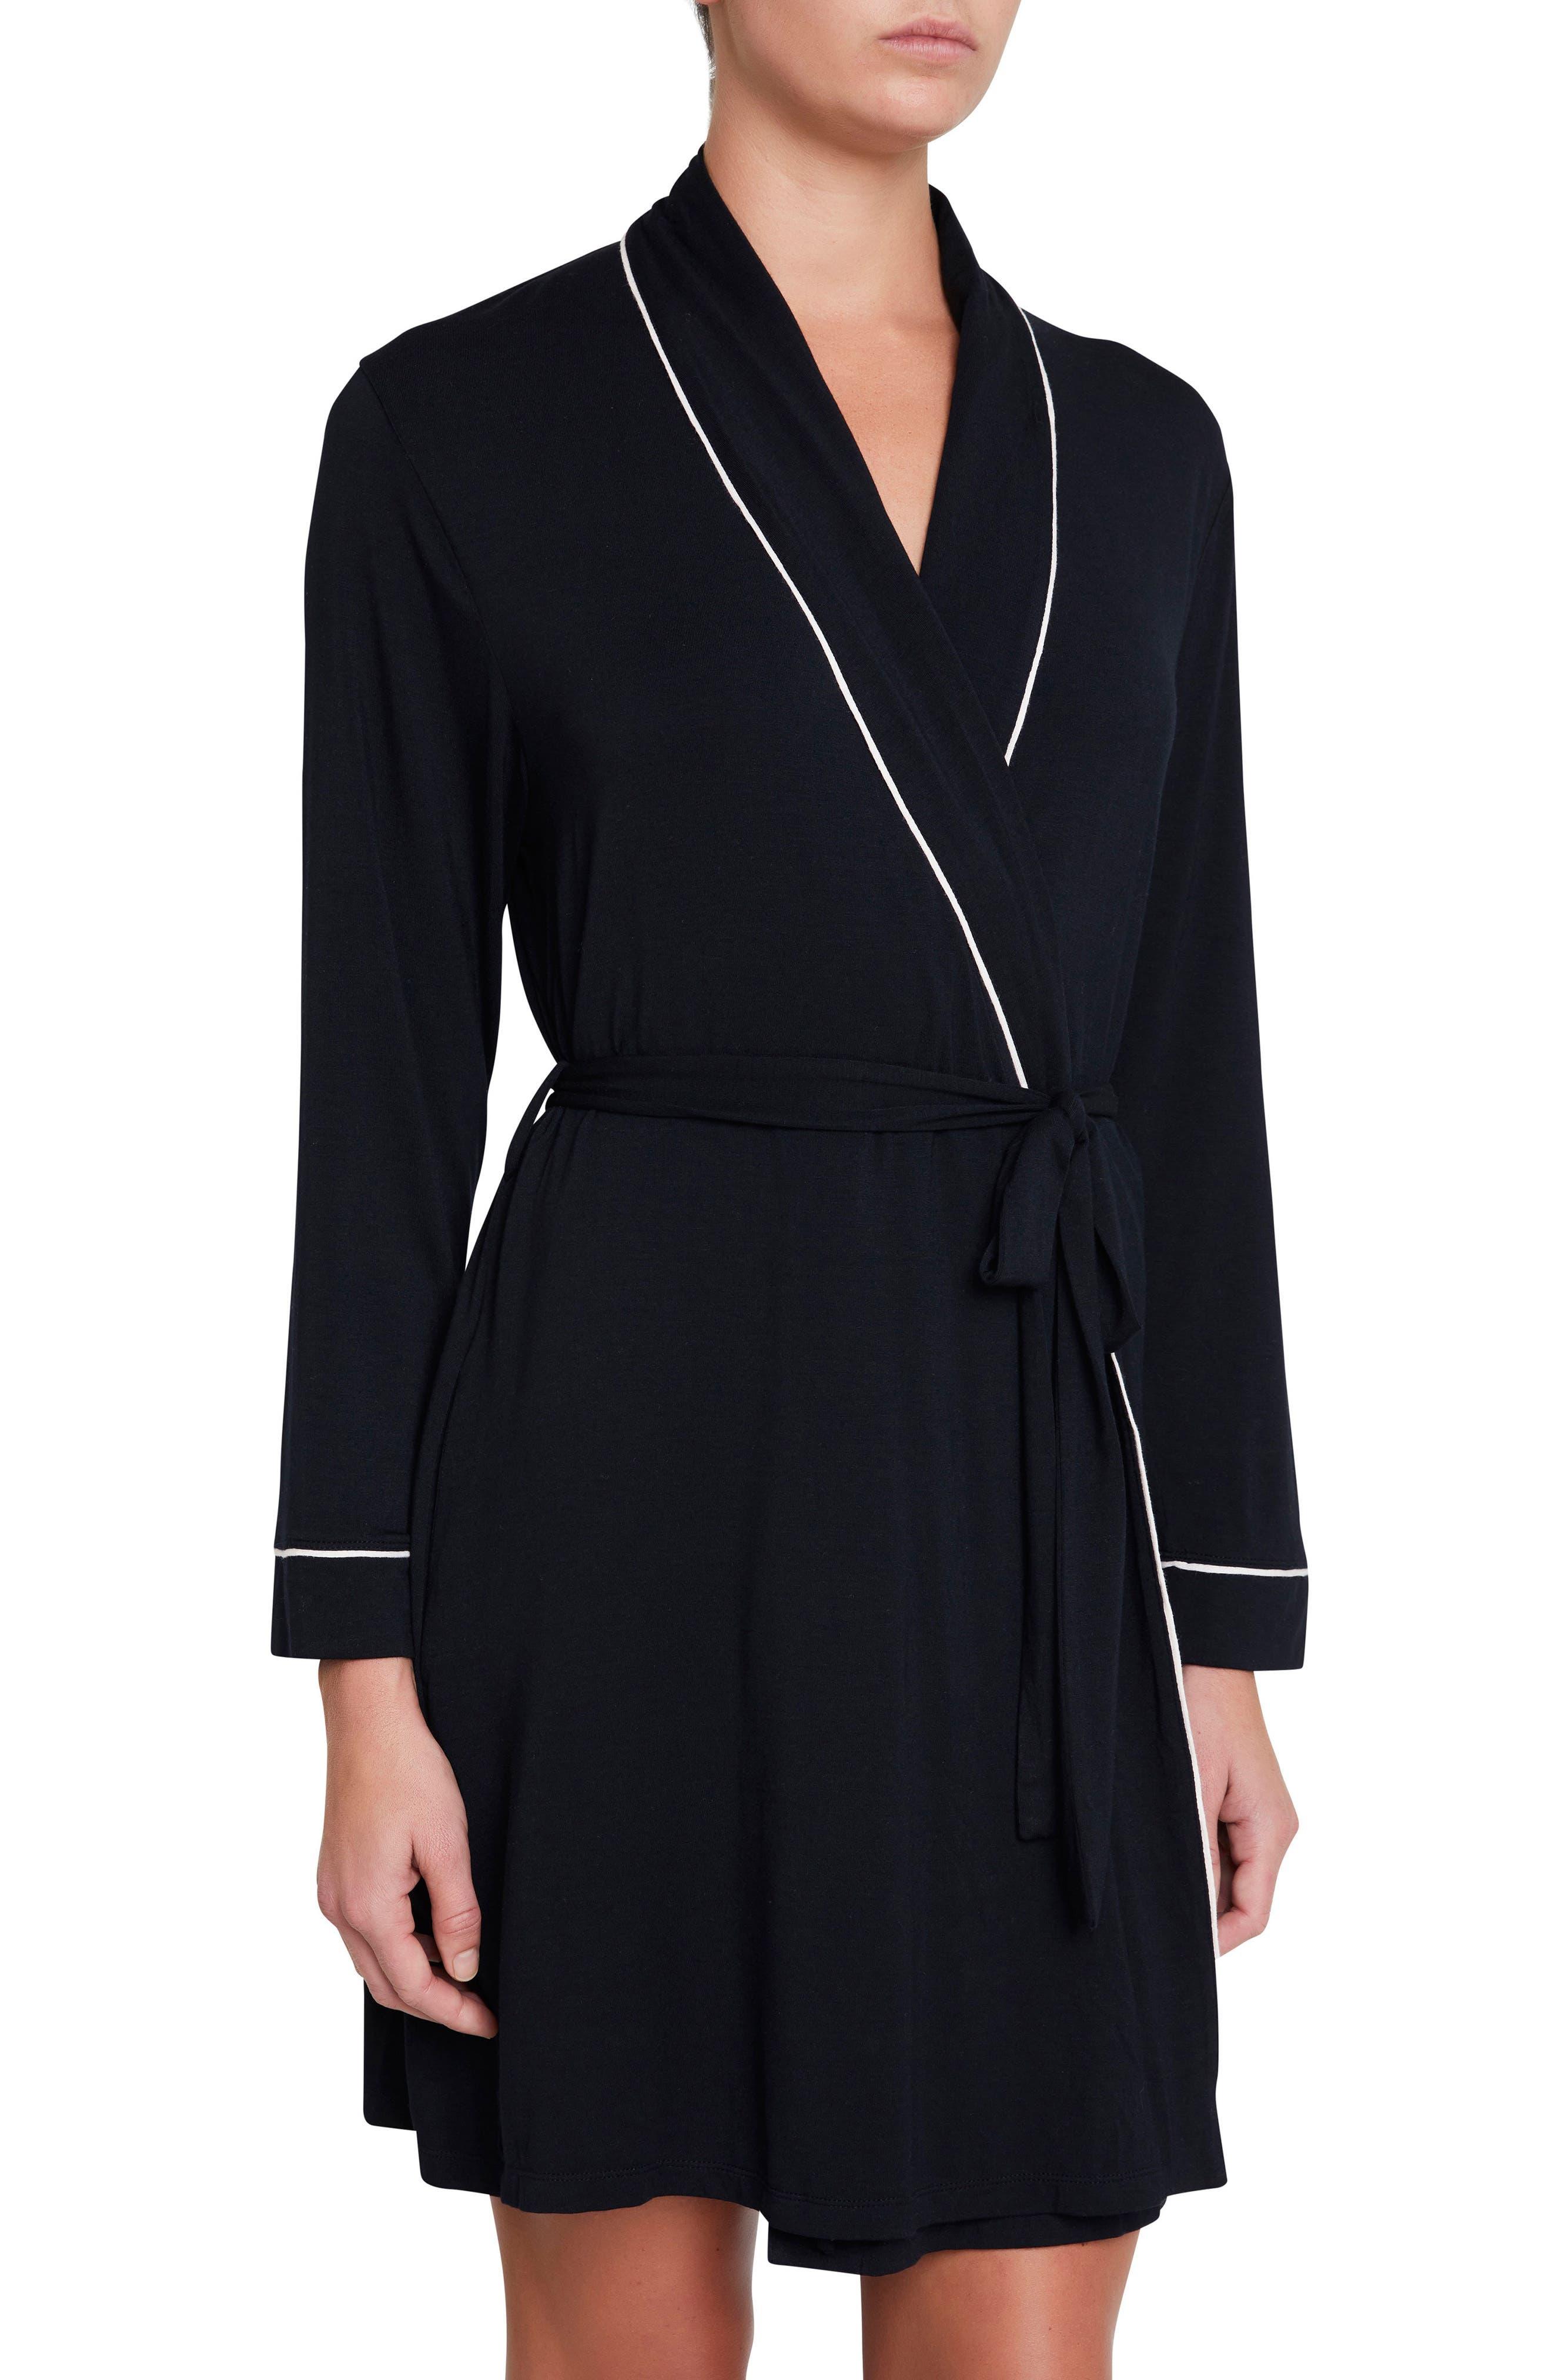 Gisele Classic Robe,                         Main,                         color, Black/ Sorbet